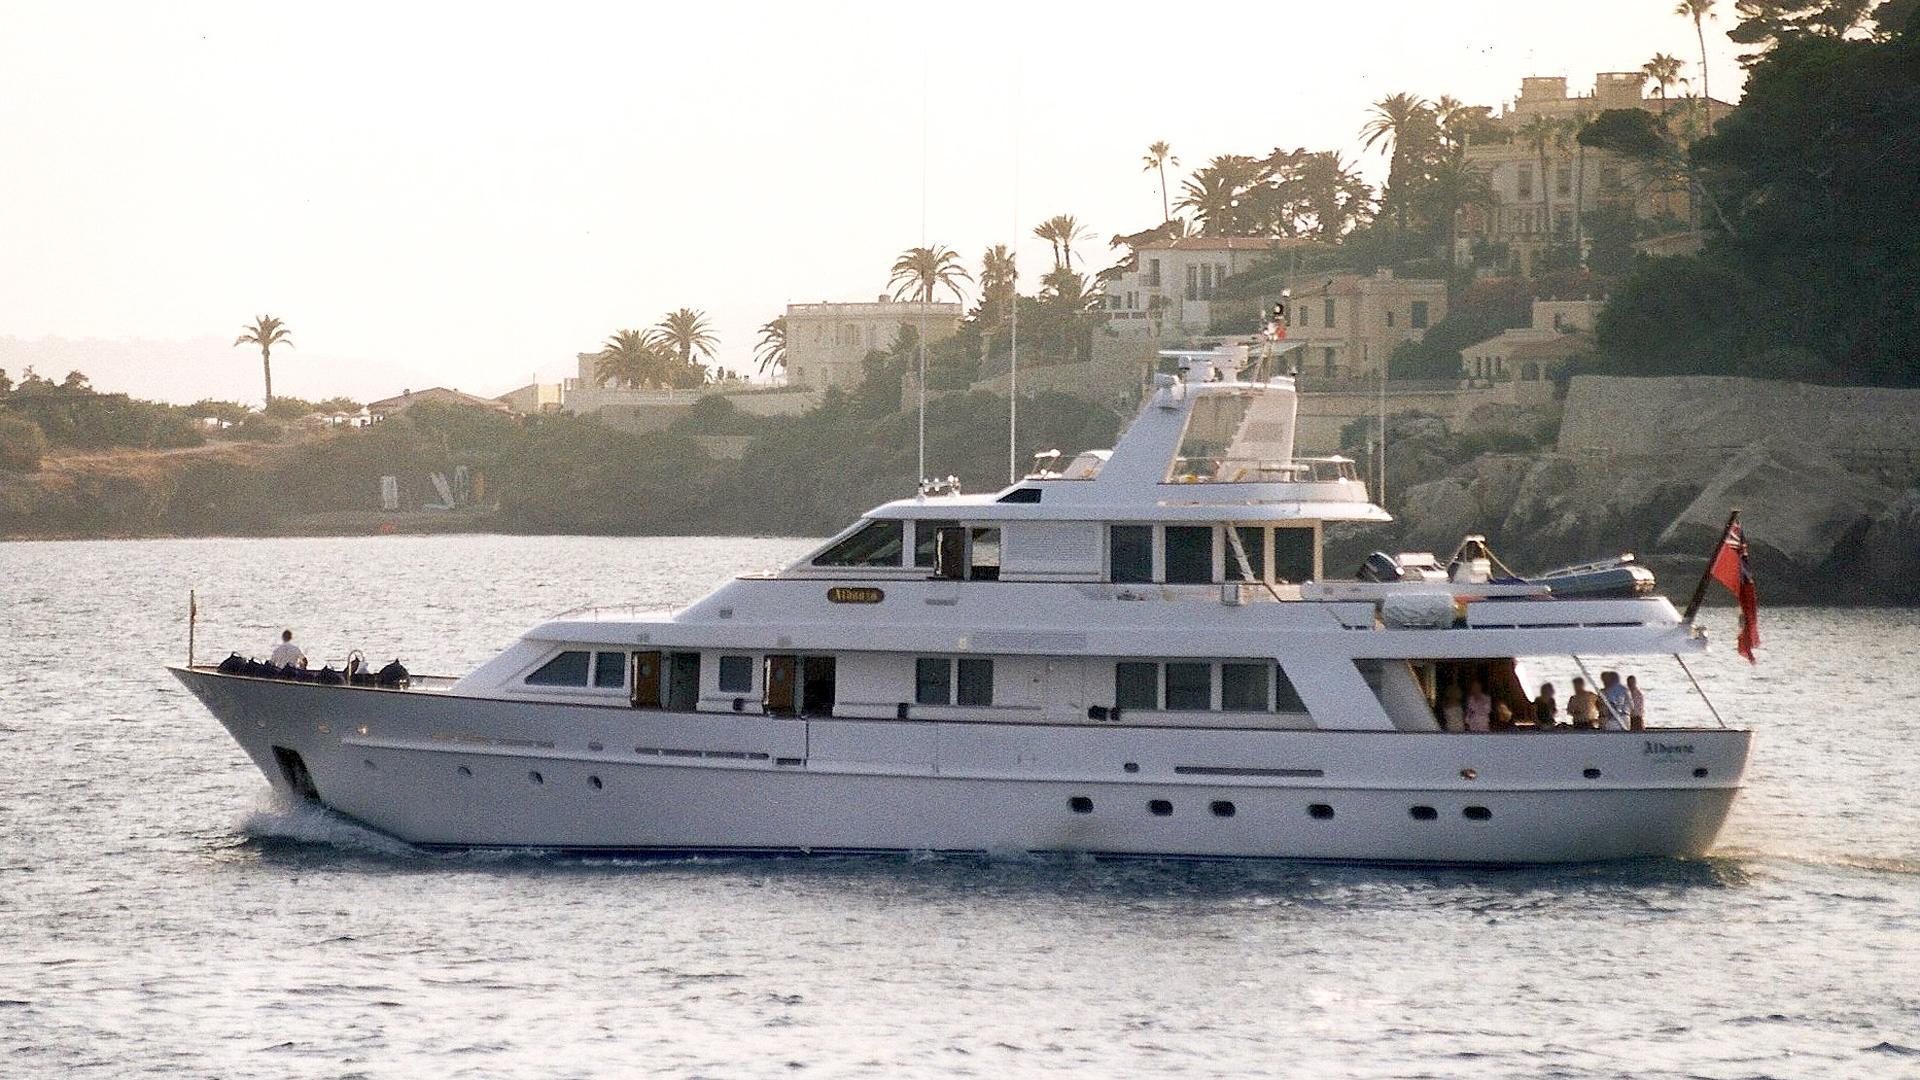 aldonza-of-cayman-islands-motor-yacht-mallorca-1995-32m-profile